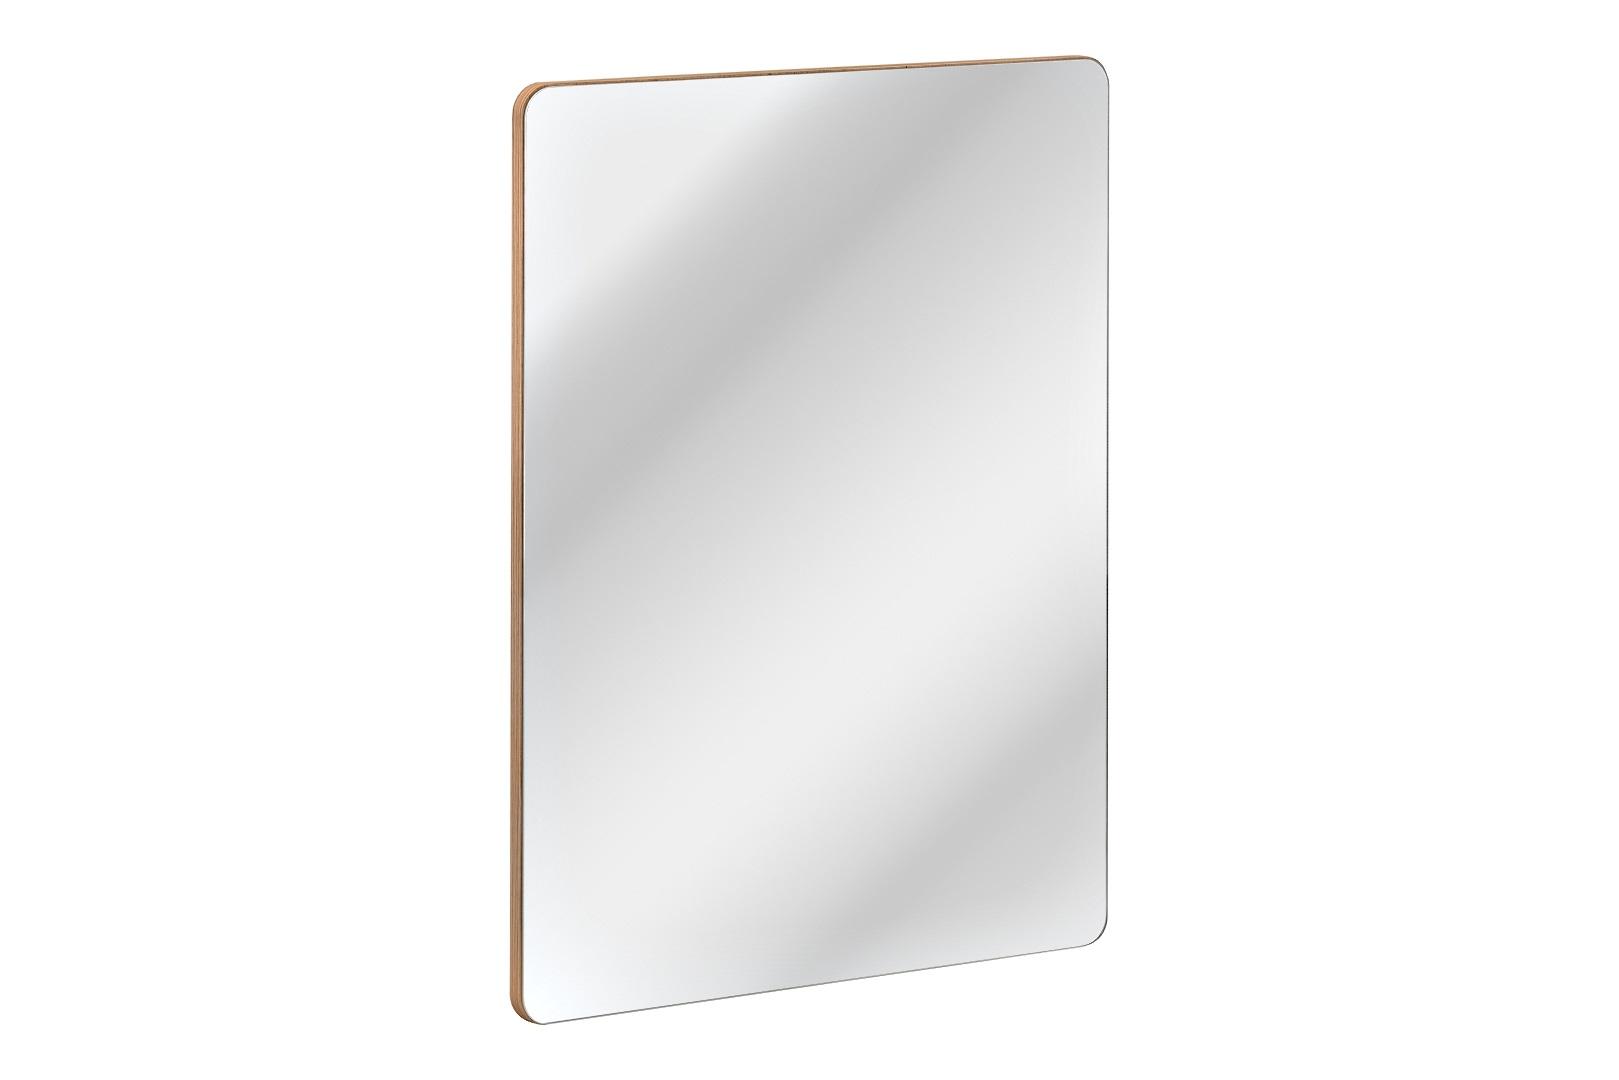 Oglinda pentru baie, L80xl60 cm, Aruba poza